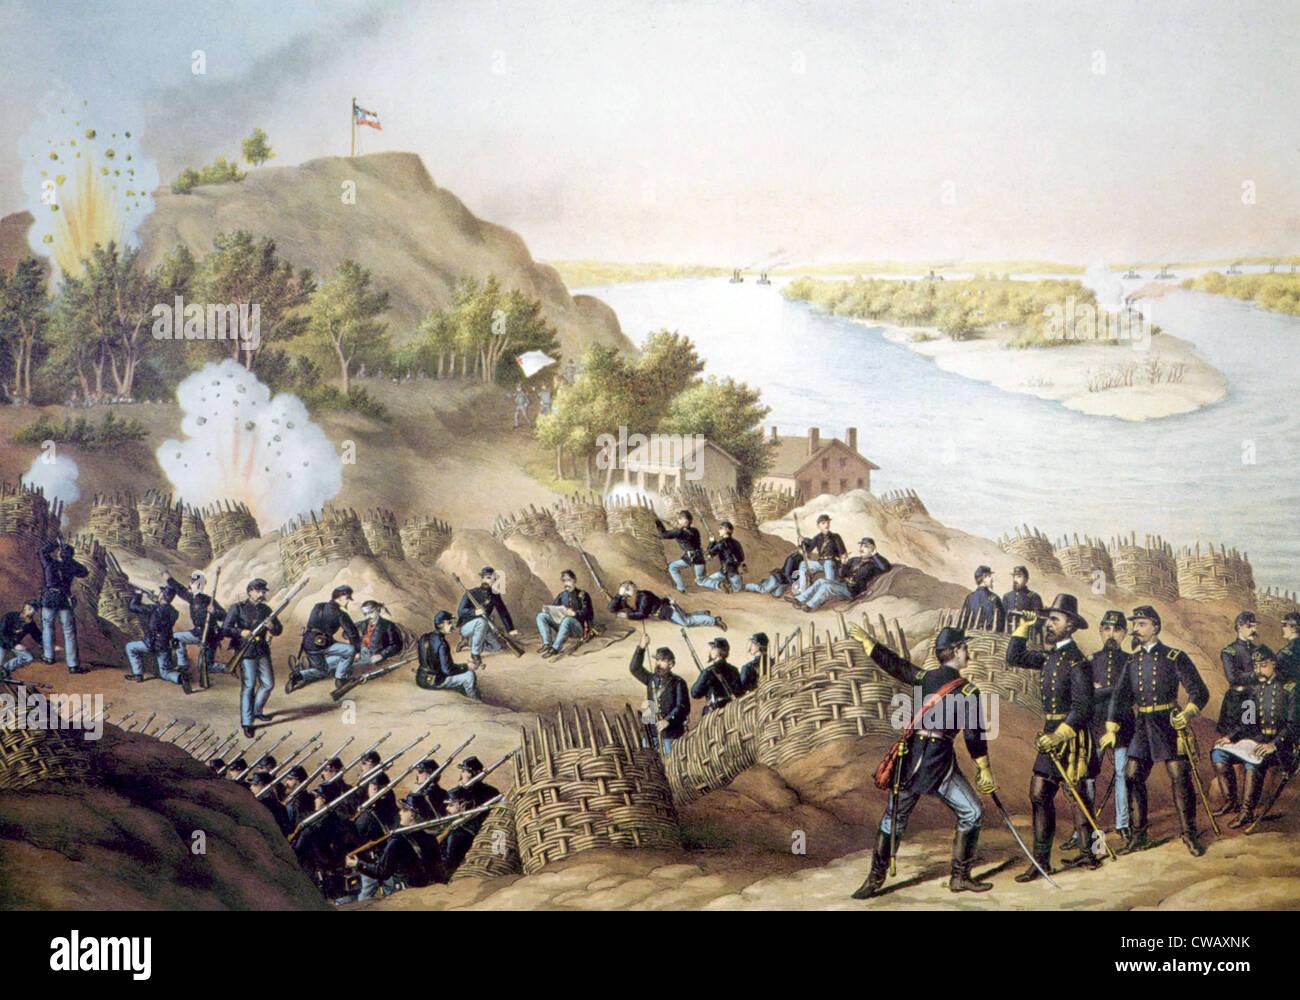 The Siege of Vicksburg, May18-July 4, 1863 - Stock Image